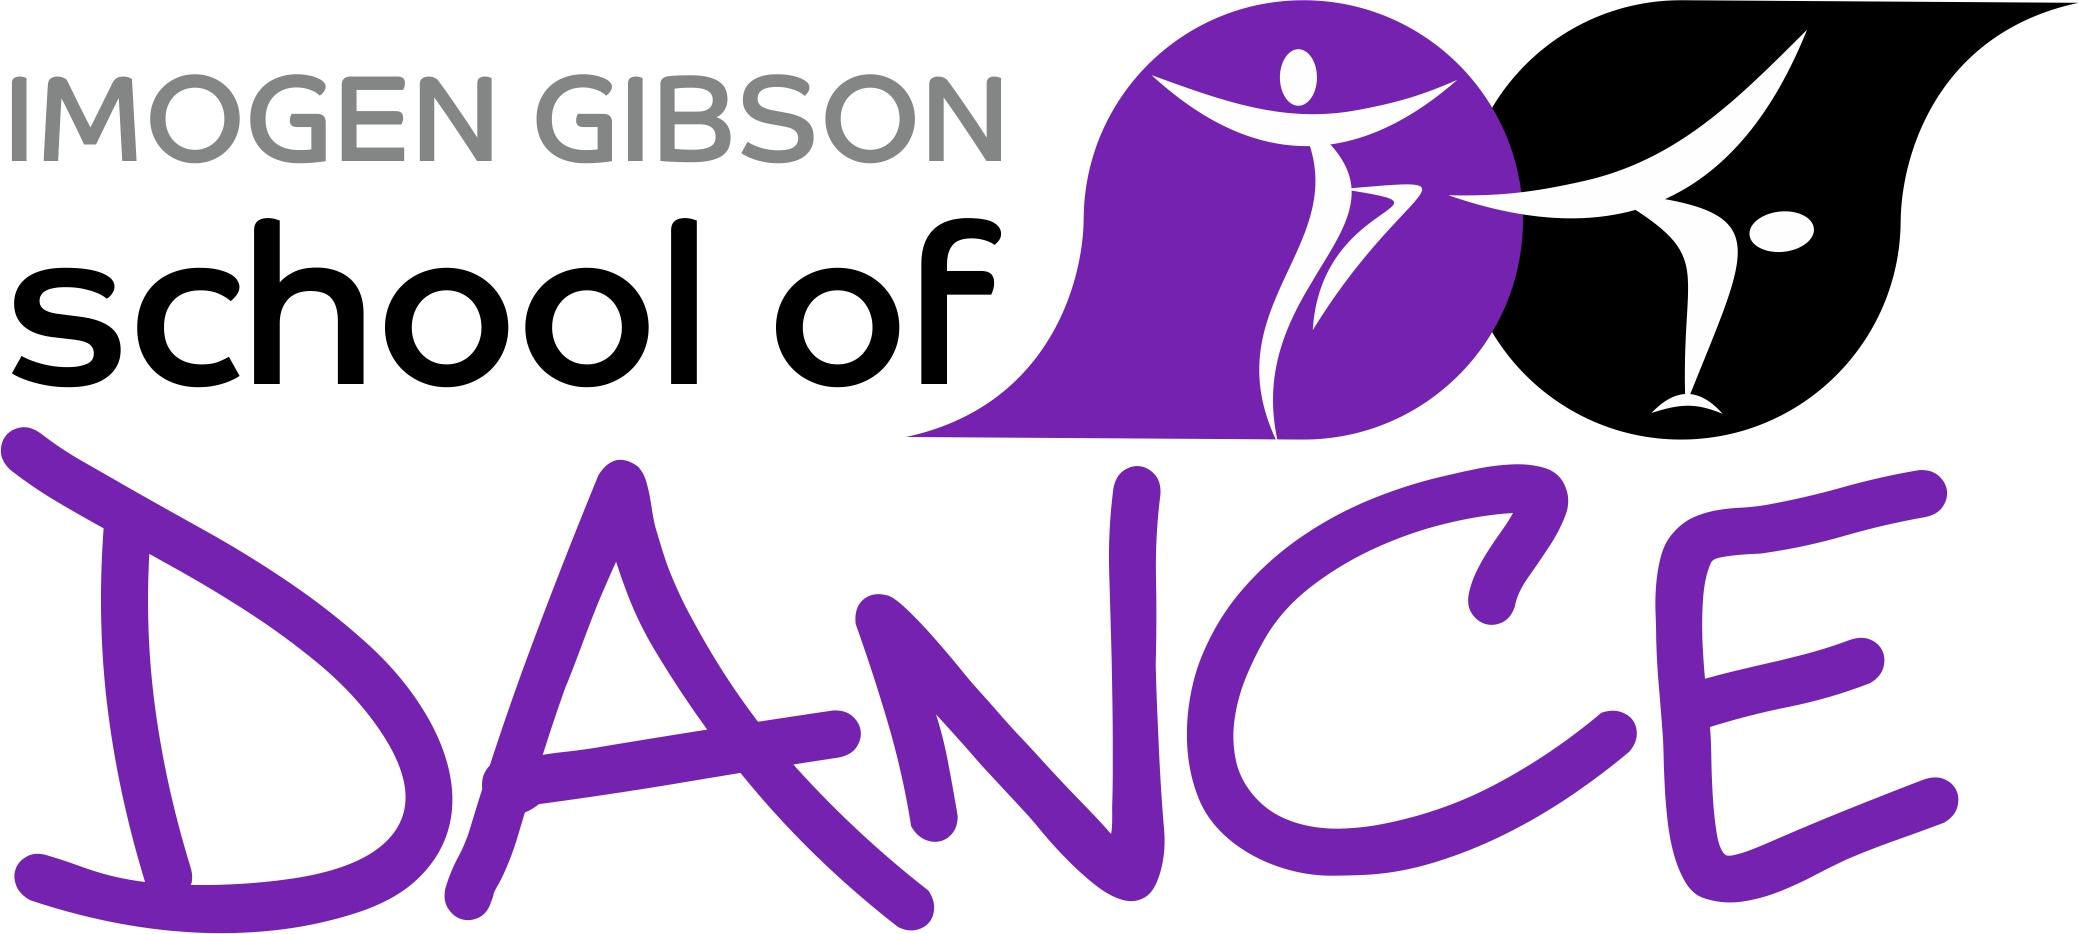 Imogen Gibson School of Dance logo